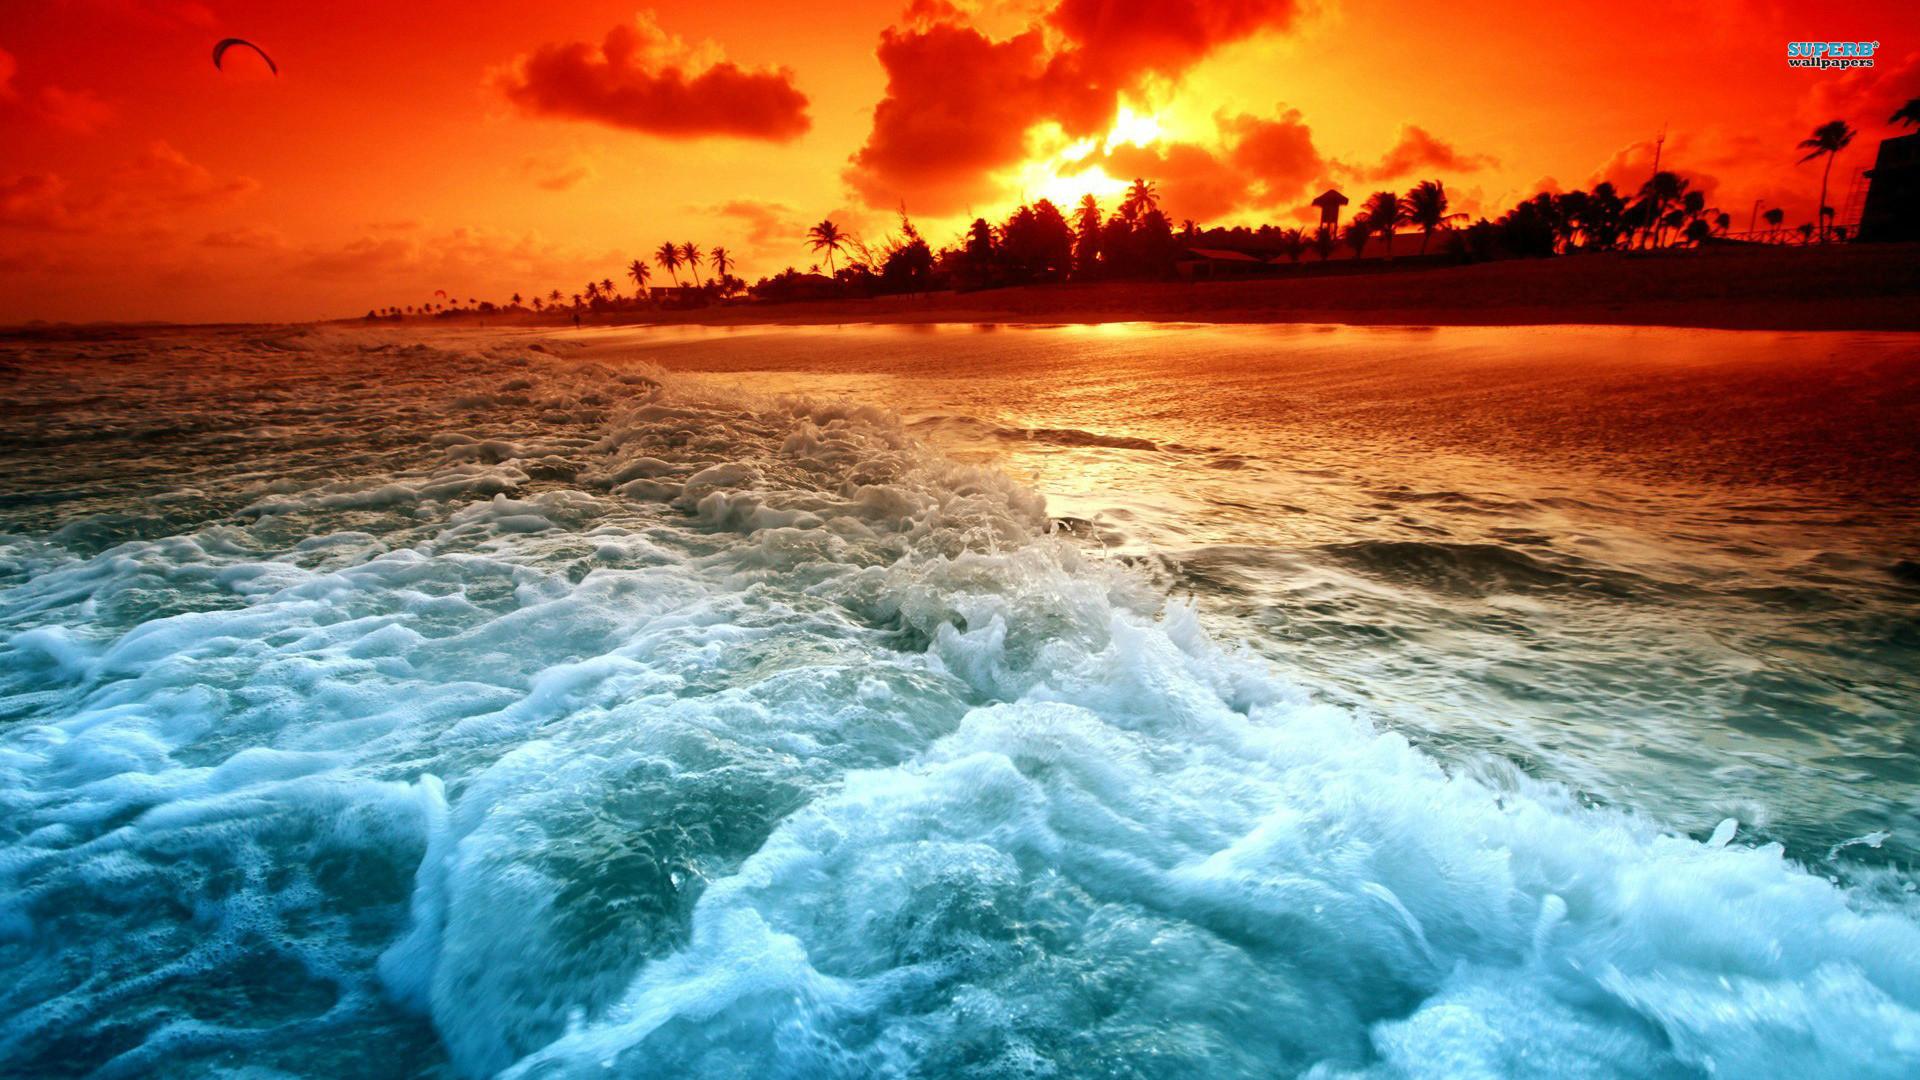 Key West Hd Wallpaper 64 Images